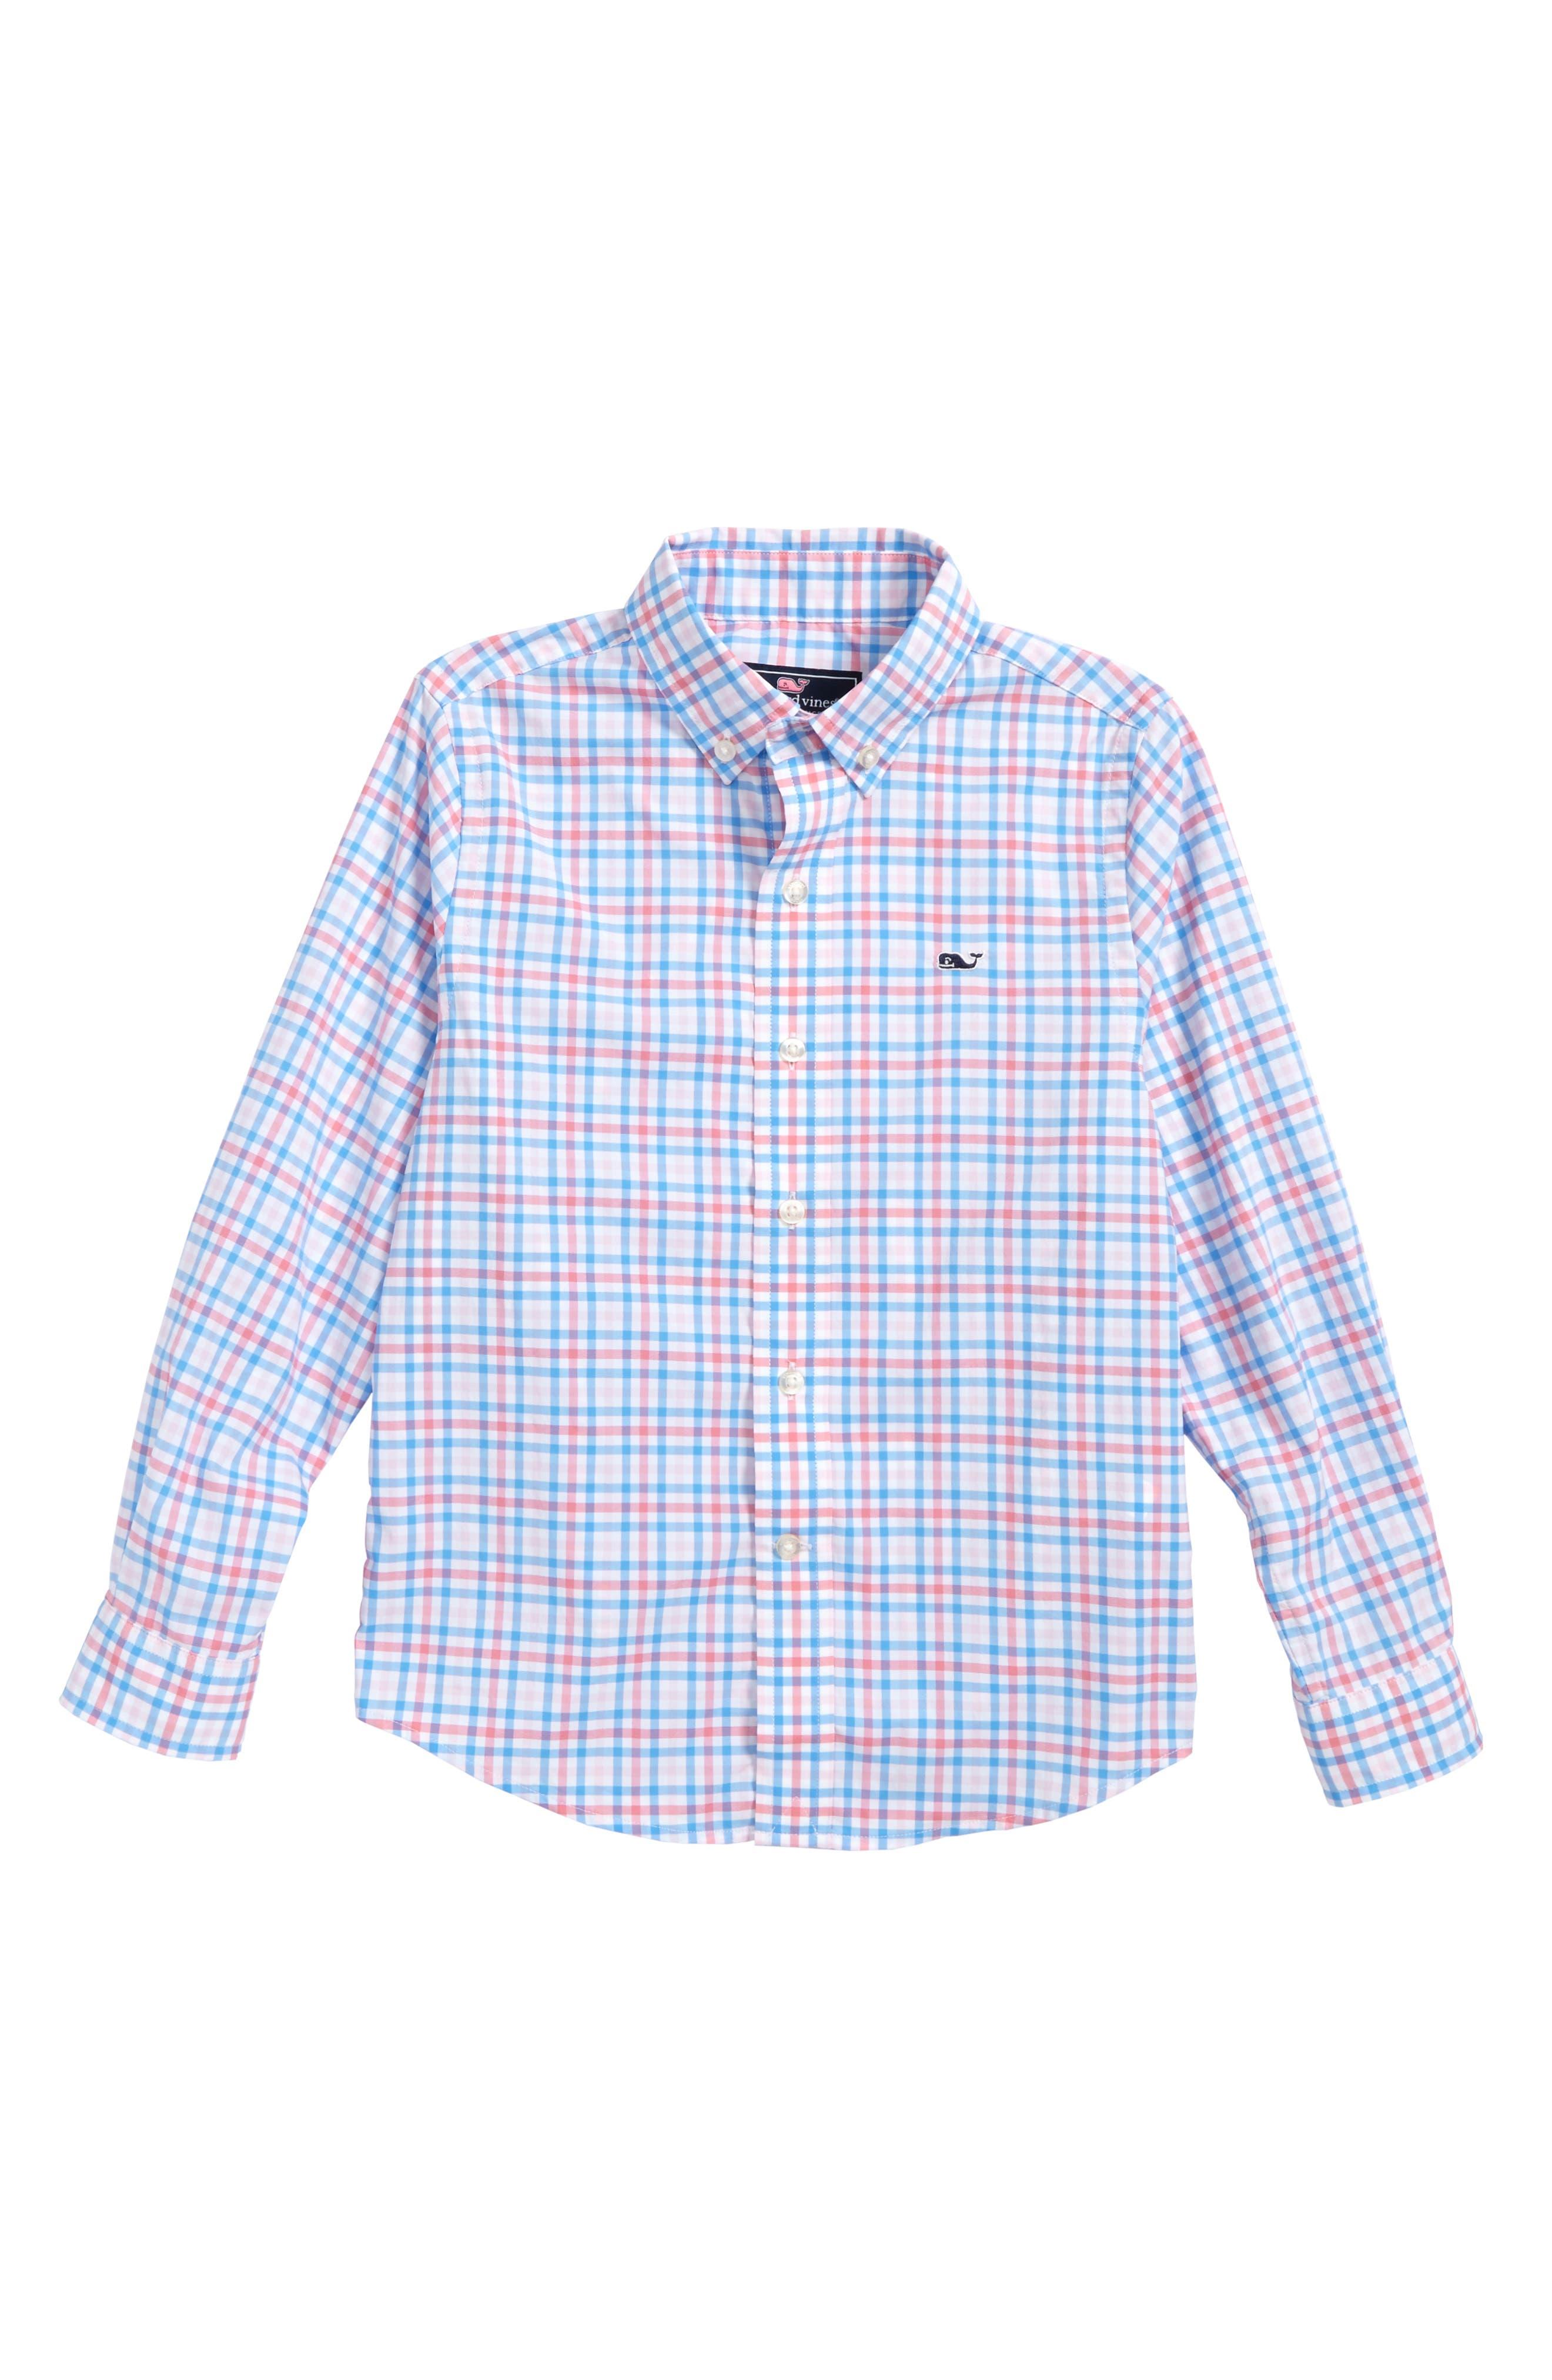 Gulf Shore Gingham Performance Woven Shirt,                             Main thumbnail 1, color,                             400